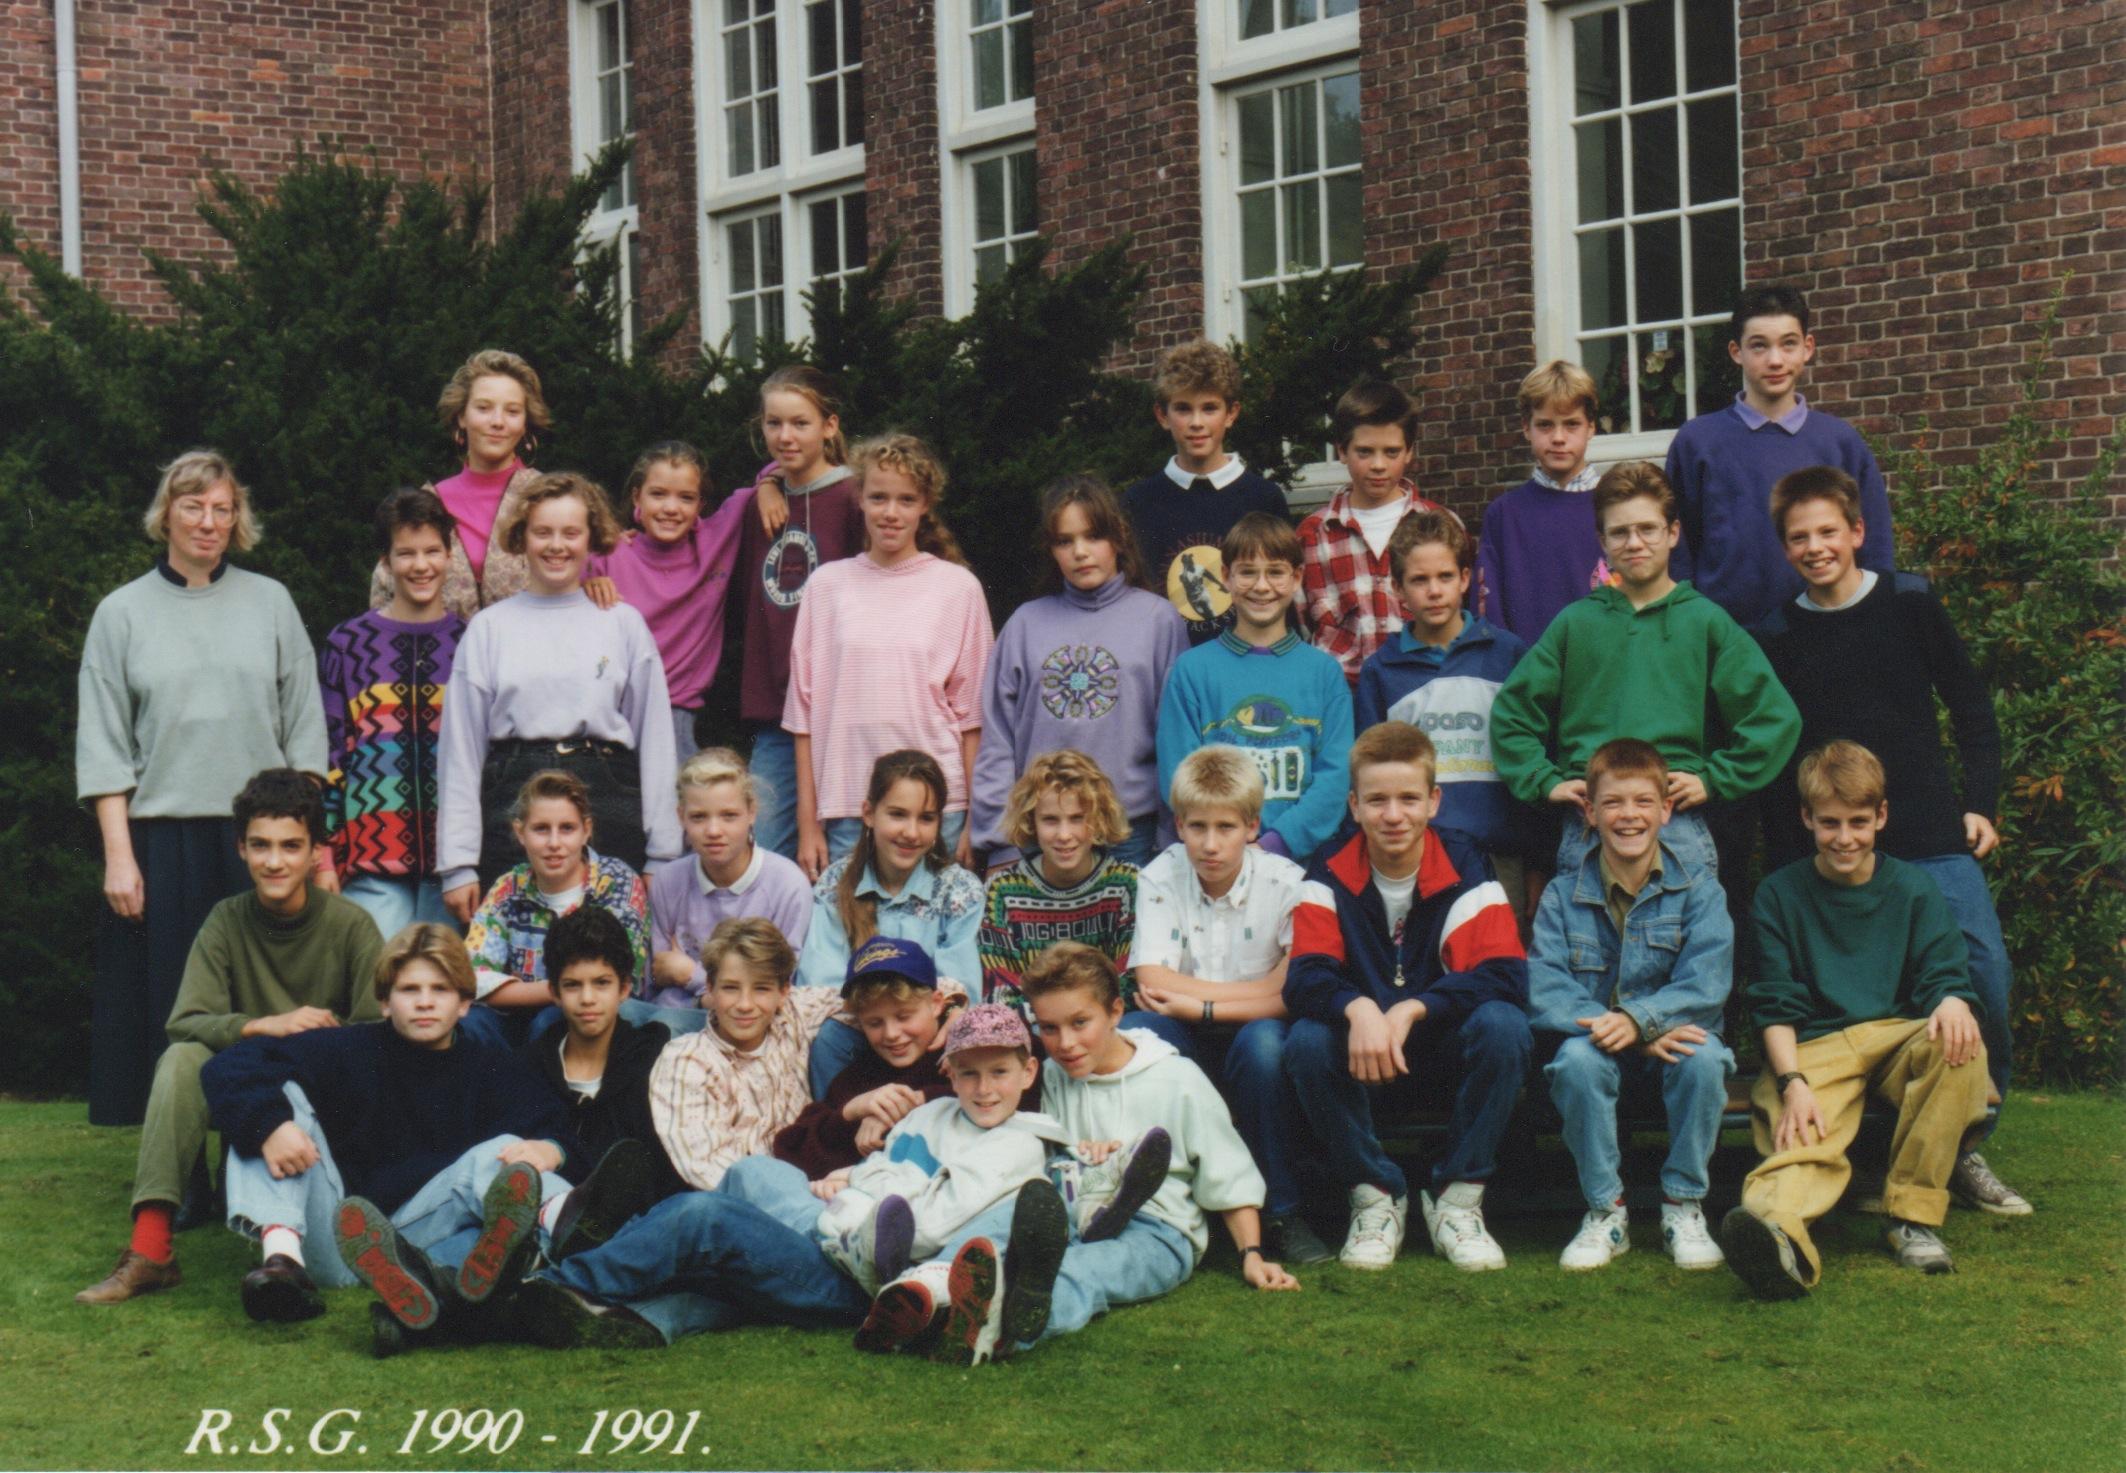 RSG Thorbecke (voorheen Rijks HBS) foto